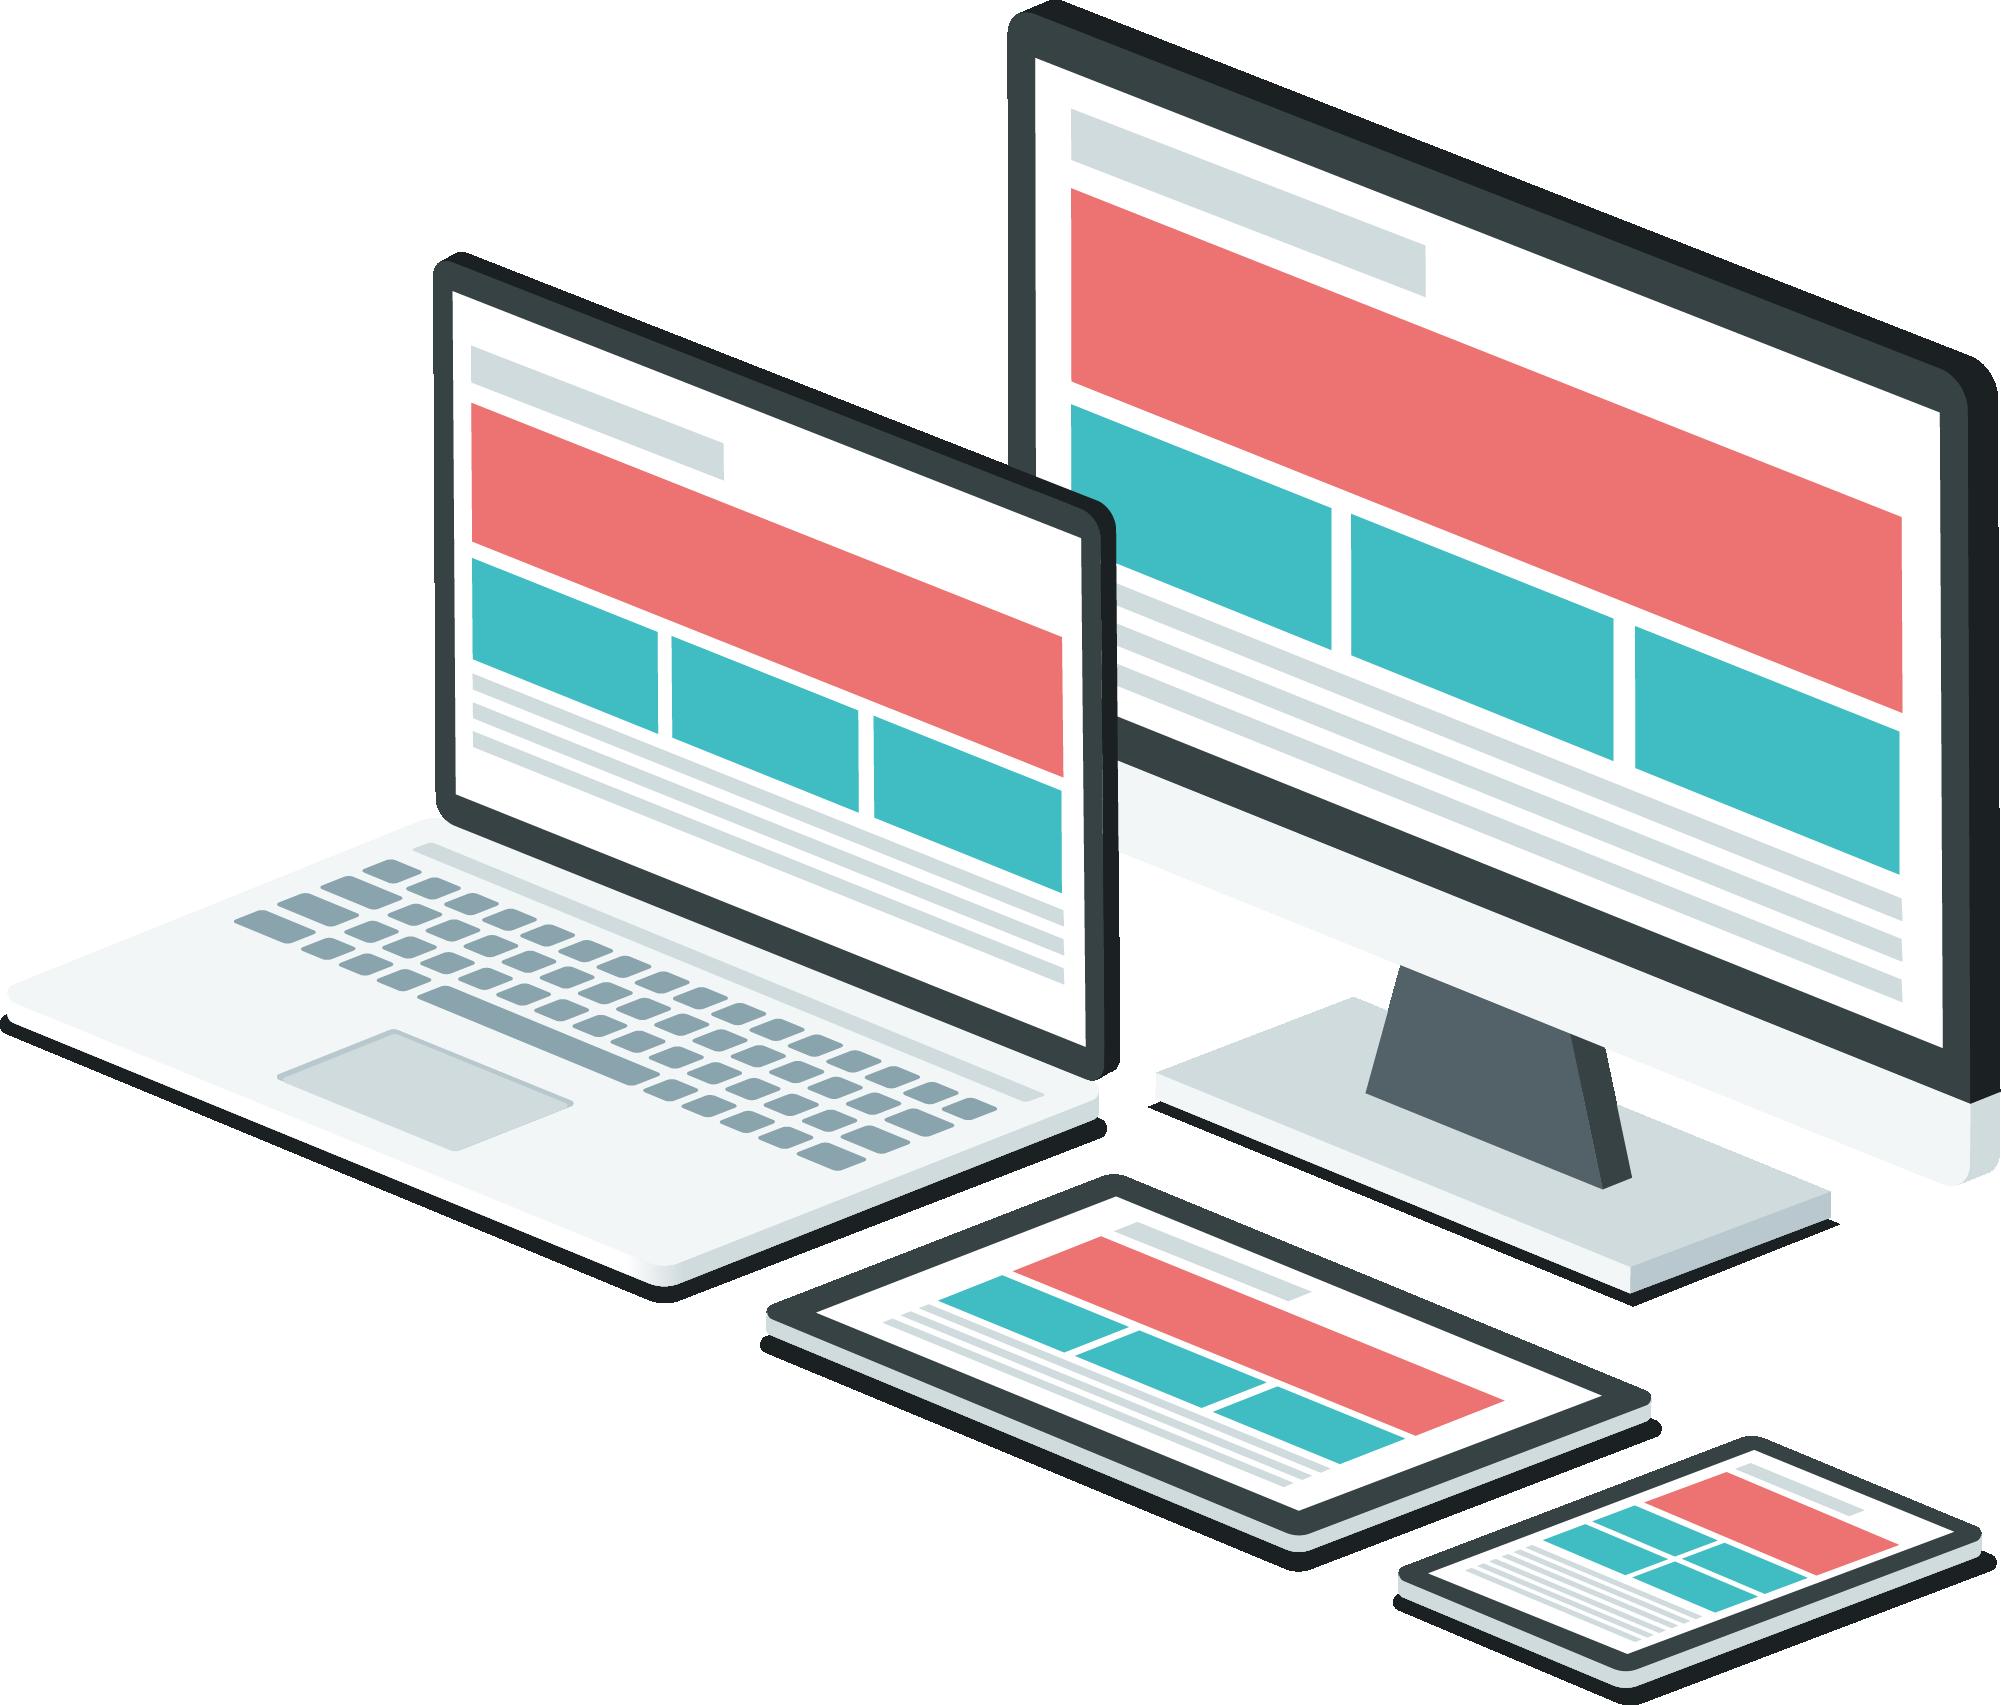 web design in virudhunagar